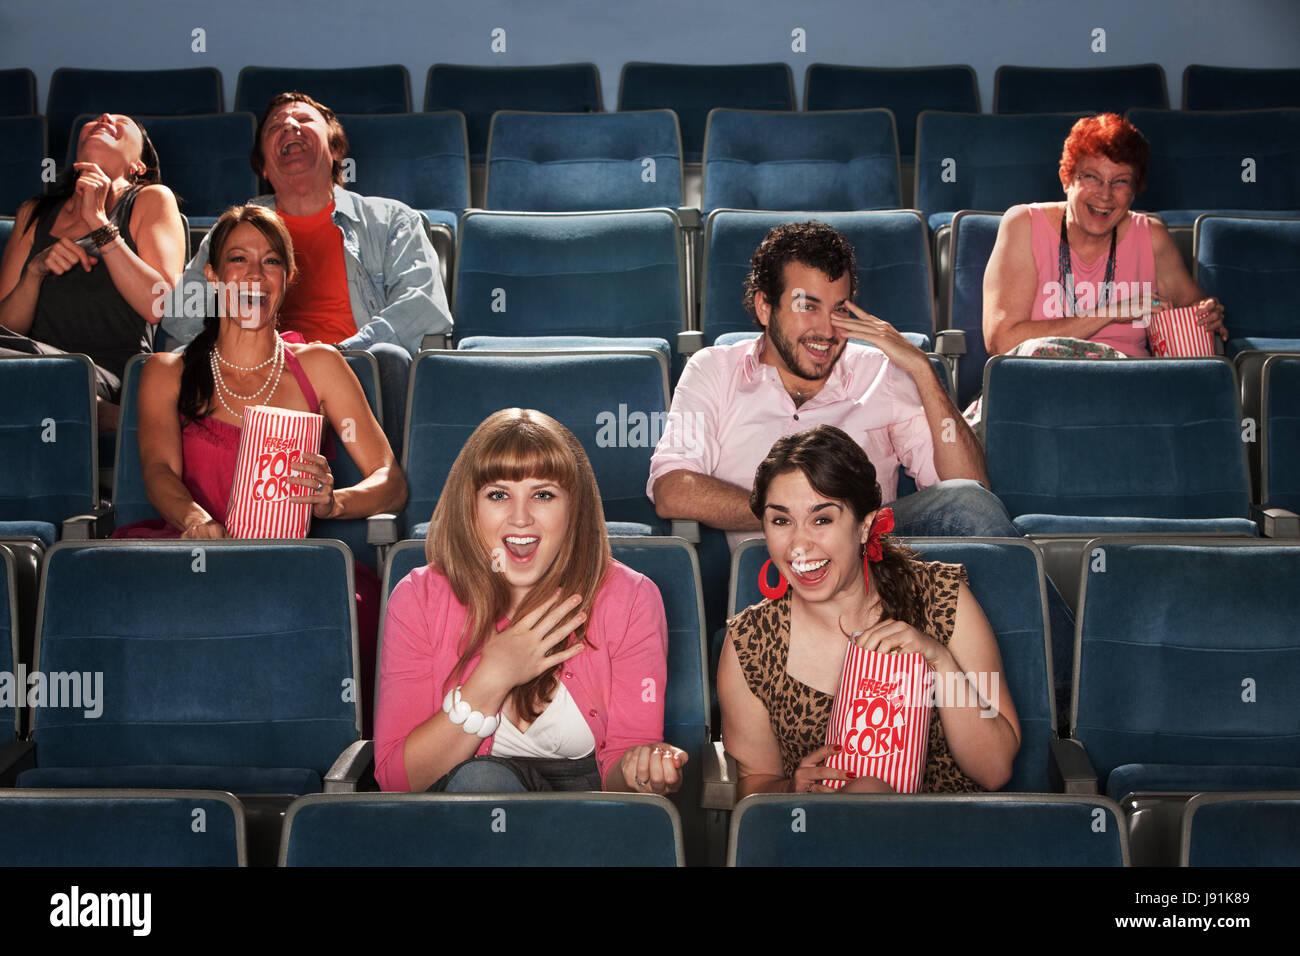 blank, european, caucasian, chairs, bags, crowd, casserole, corny, comedy, - Stock Image